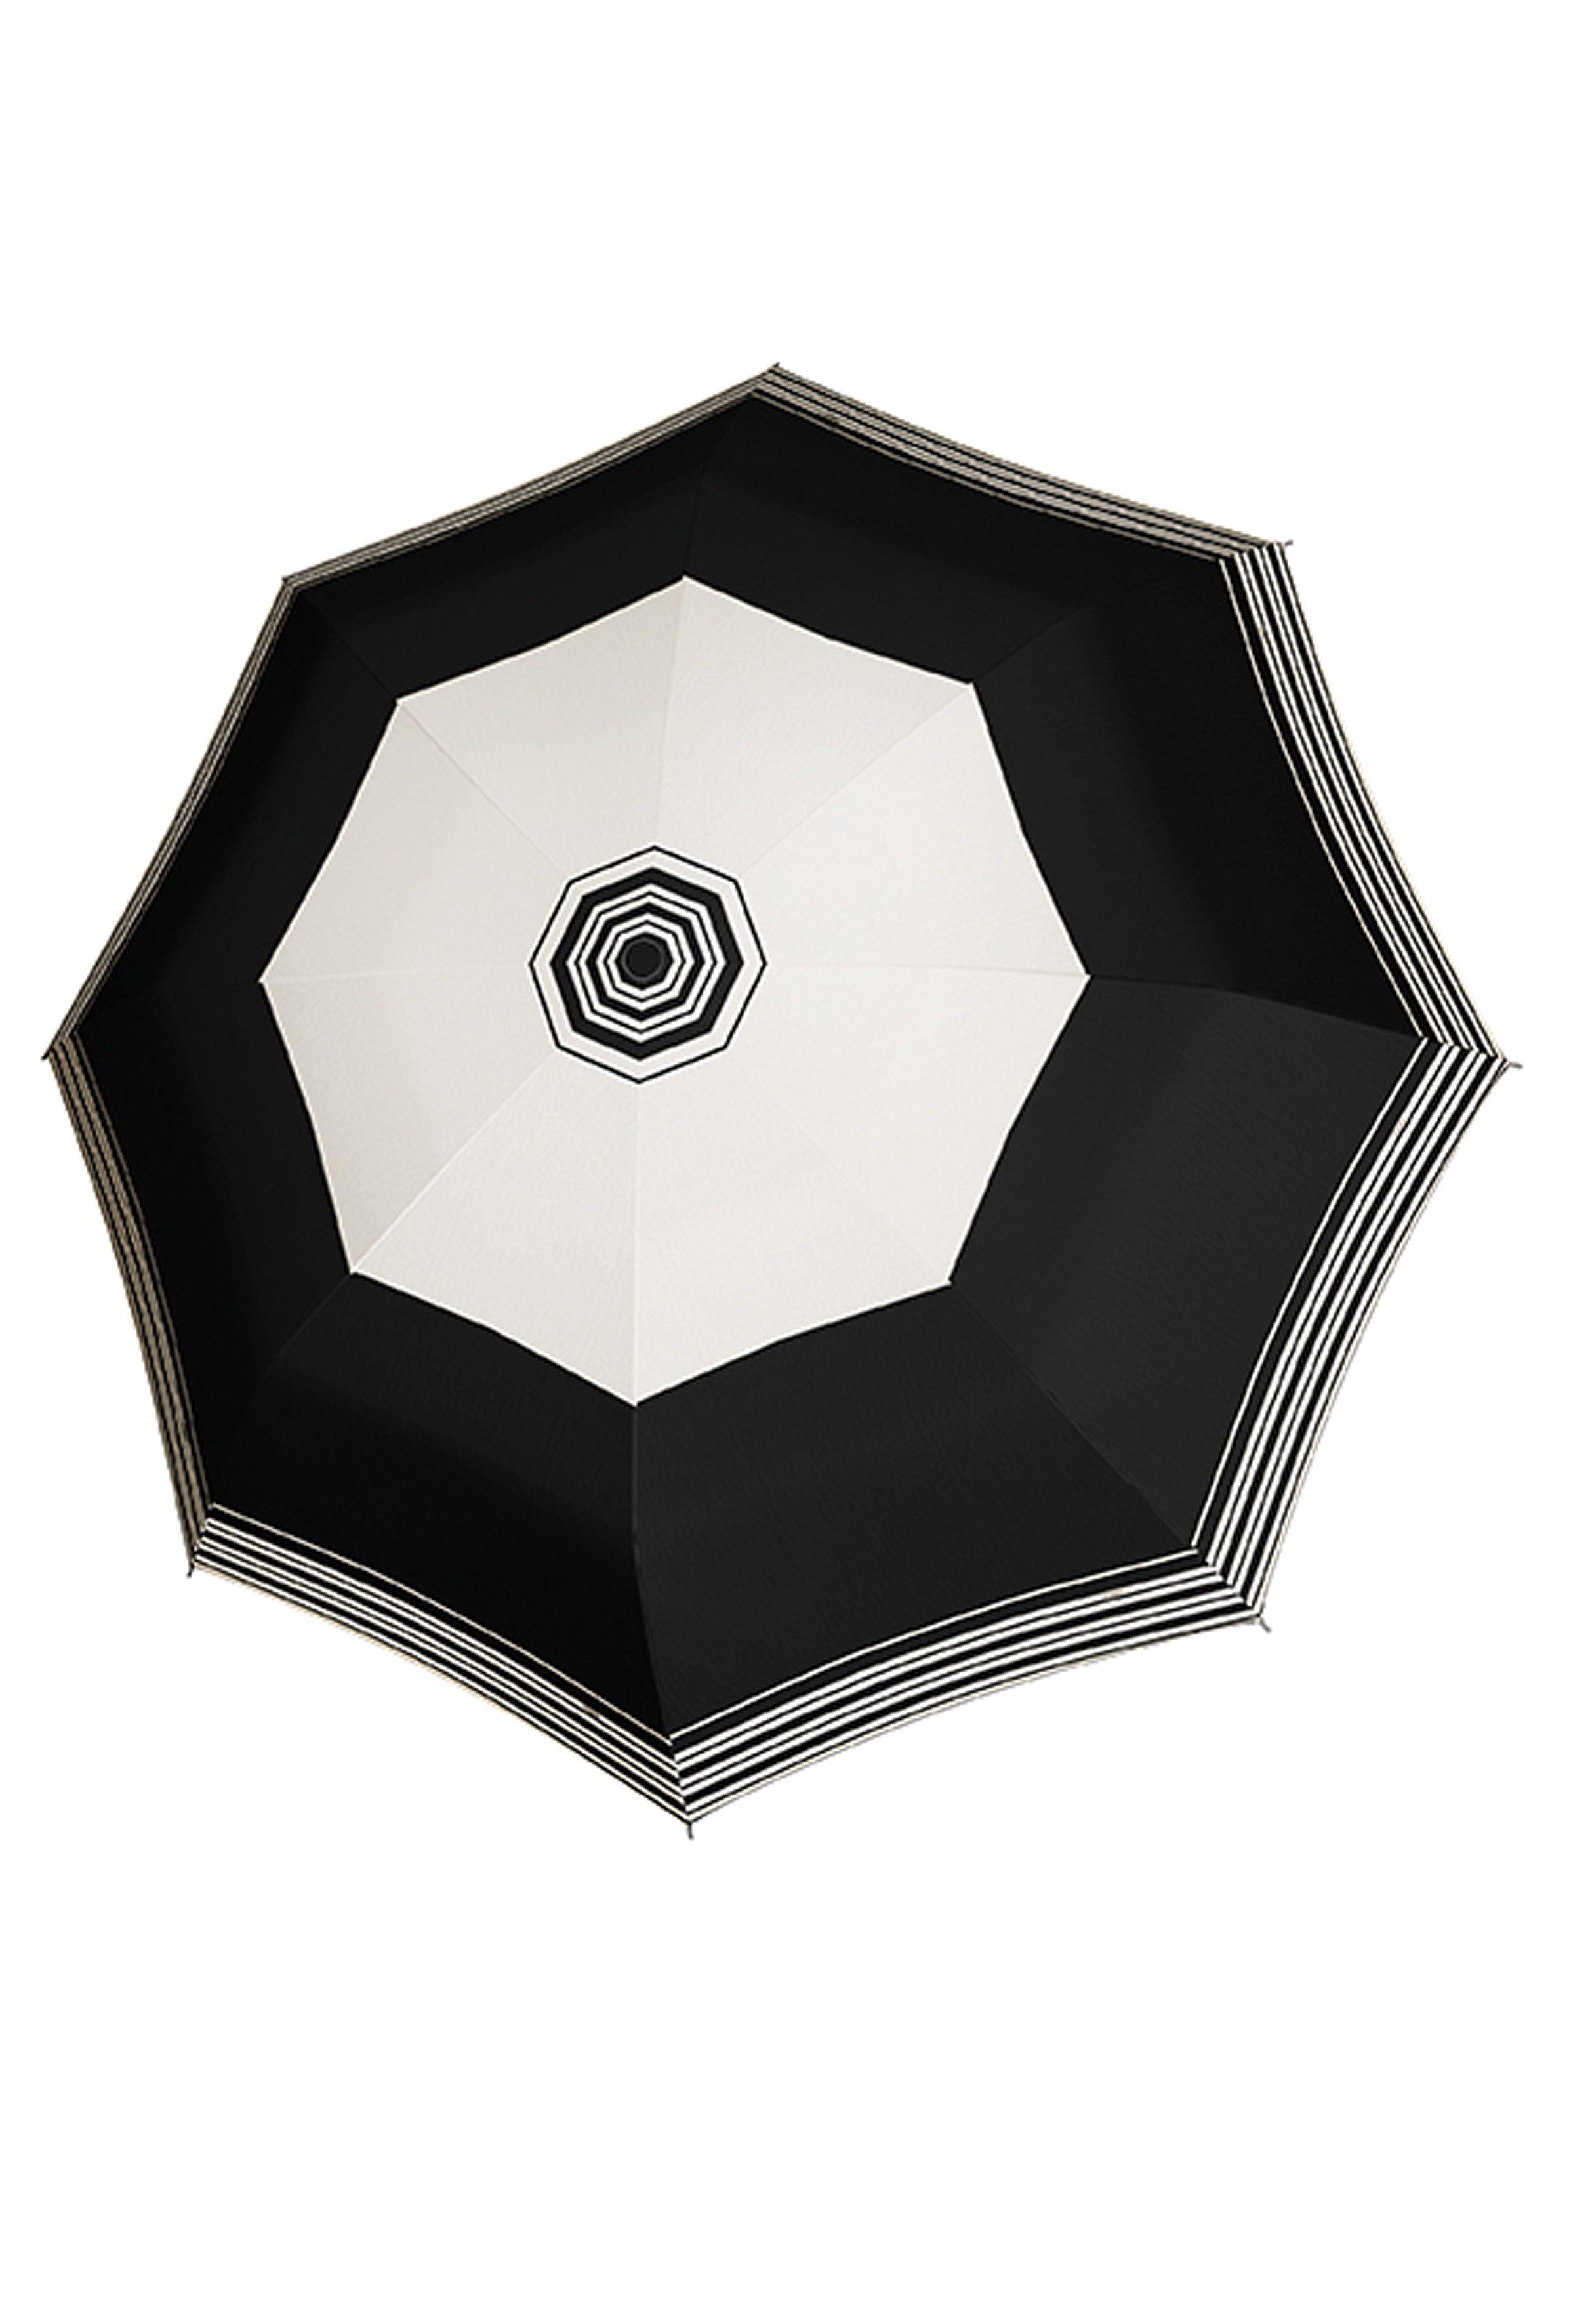 Doppler Regenschirm mit Streifen, Taschenschirm »Magic Carbonsteel - Imperial«